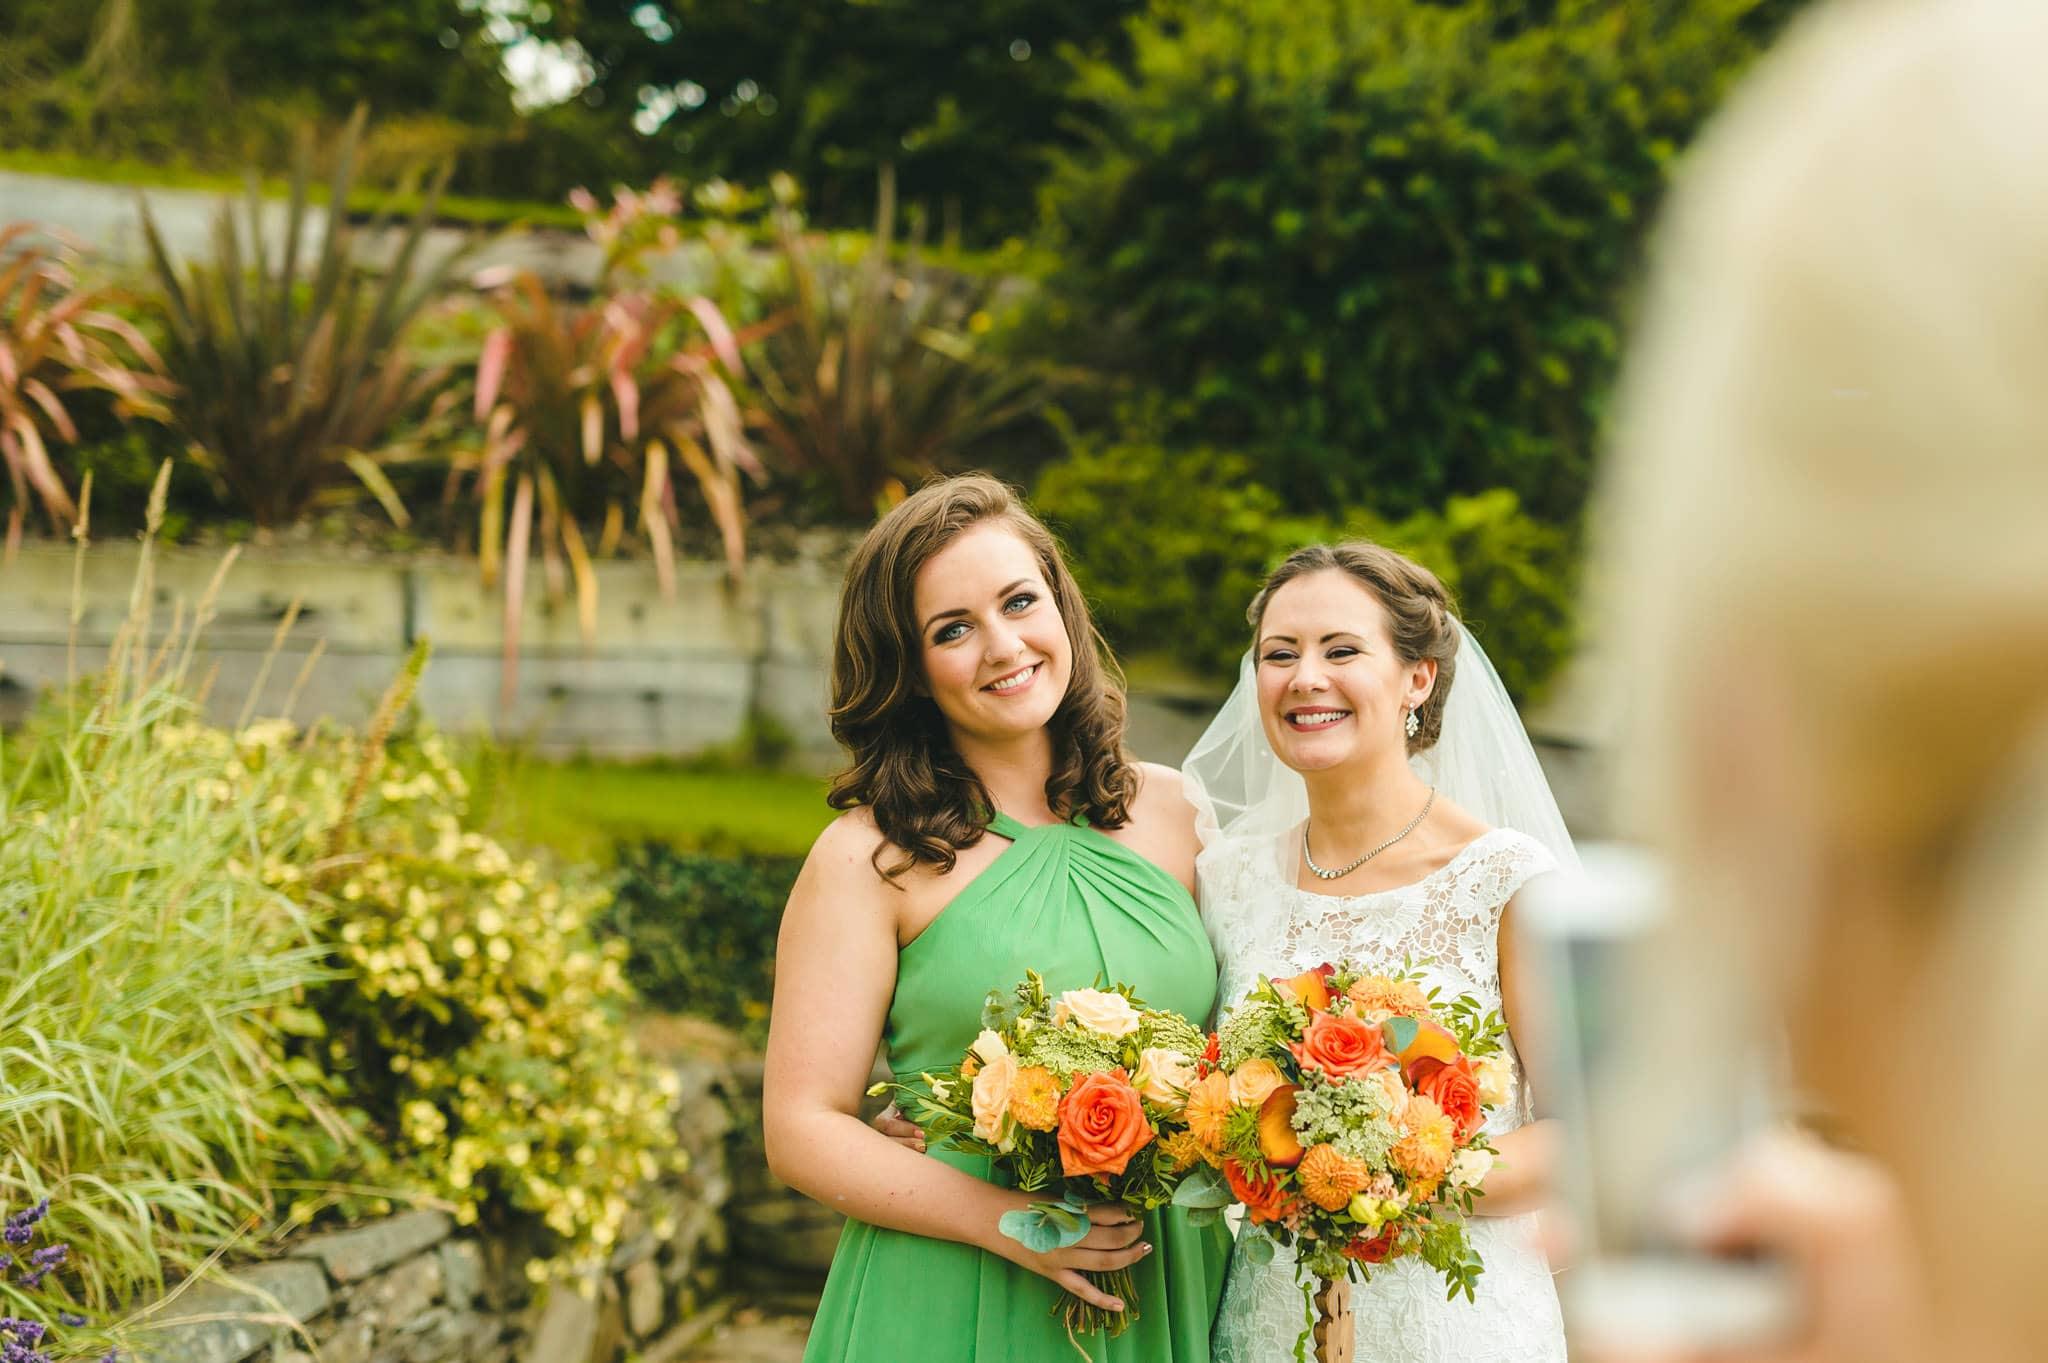 Wedding photography at Y Talbot Hotel in Tregaron, Wales   Tina + Phil 58